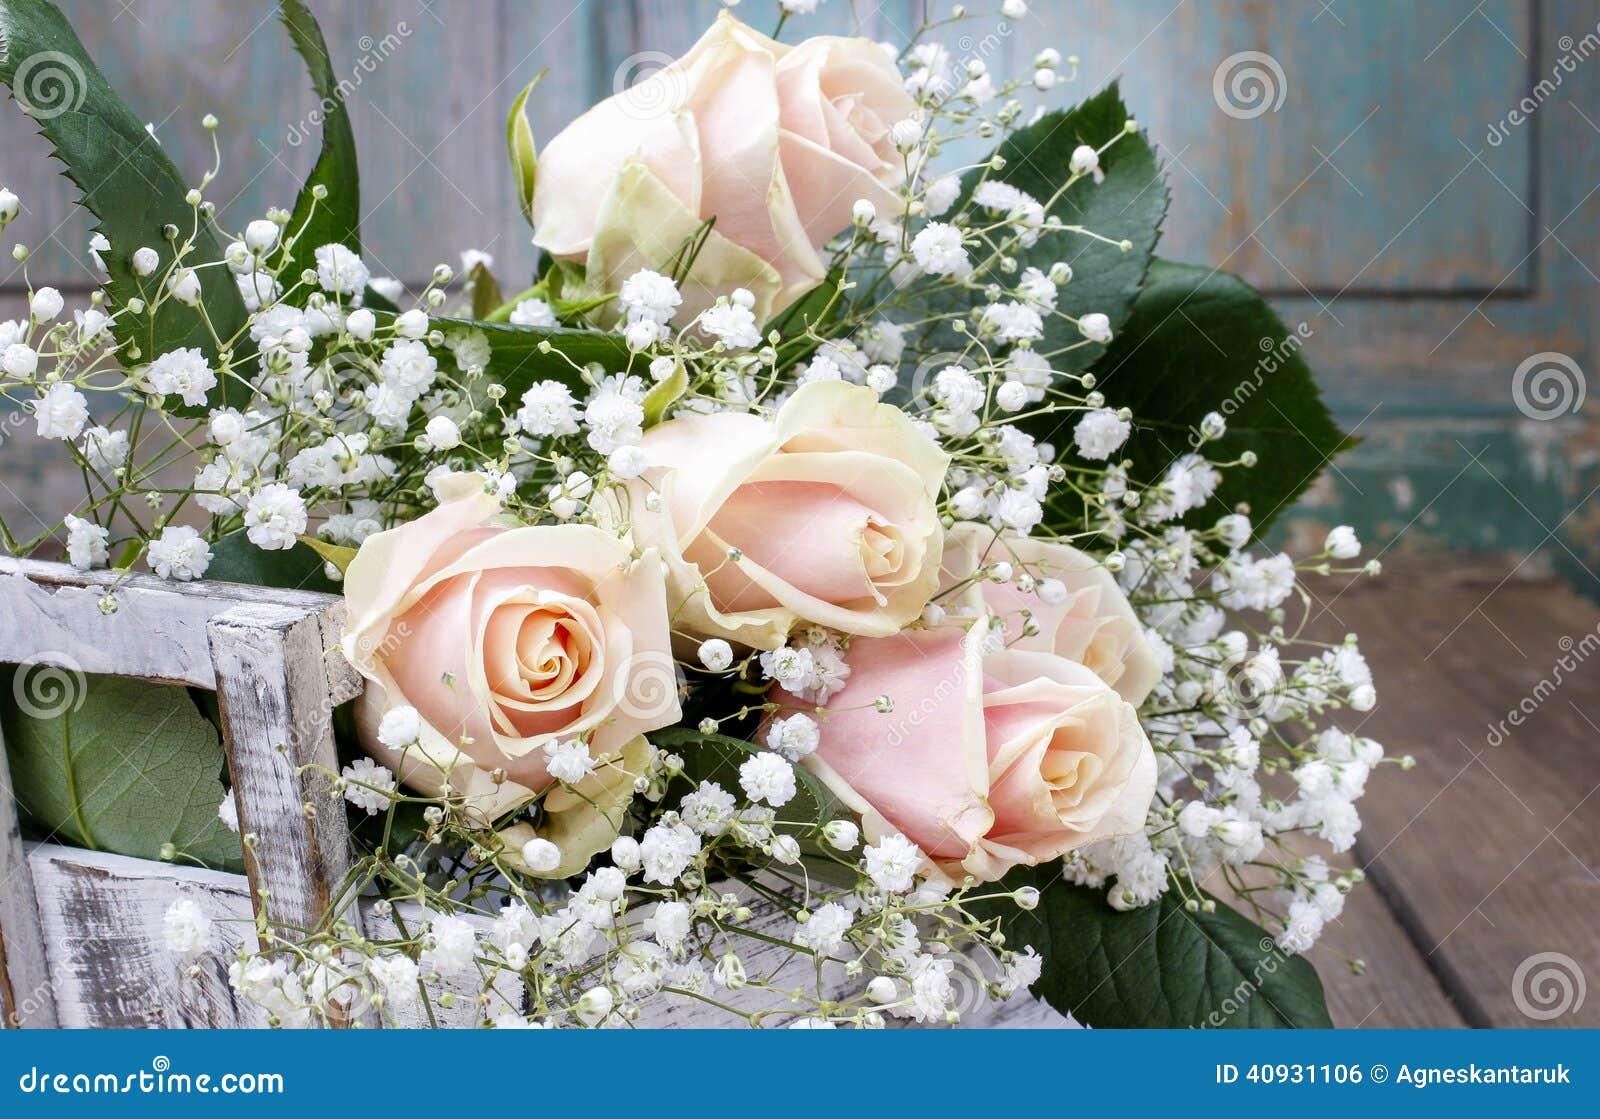 Beautiful pink roses and gypsophila paniculata babys breath stock download beautiful pink roses and gypsophila paniculata babys breath stock photo image of izmirmasajfo